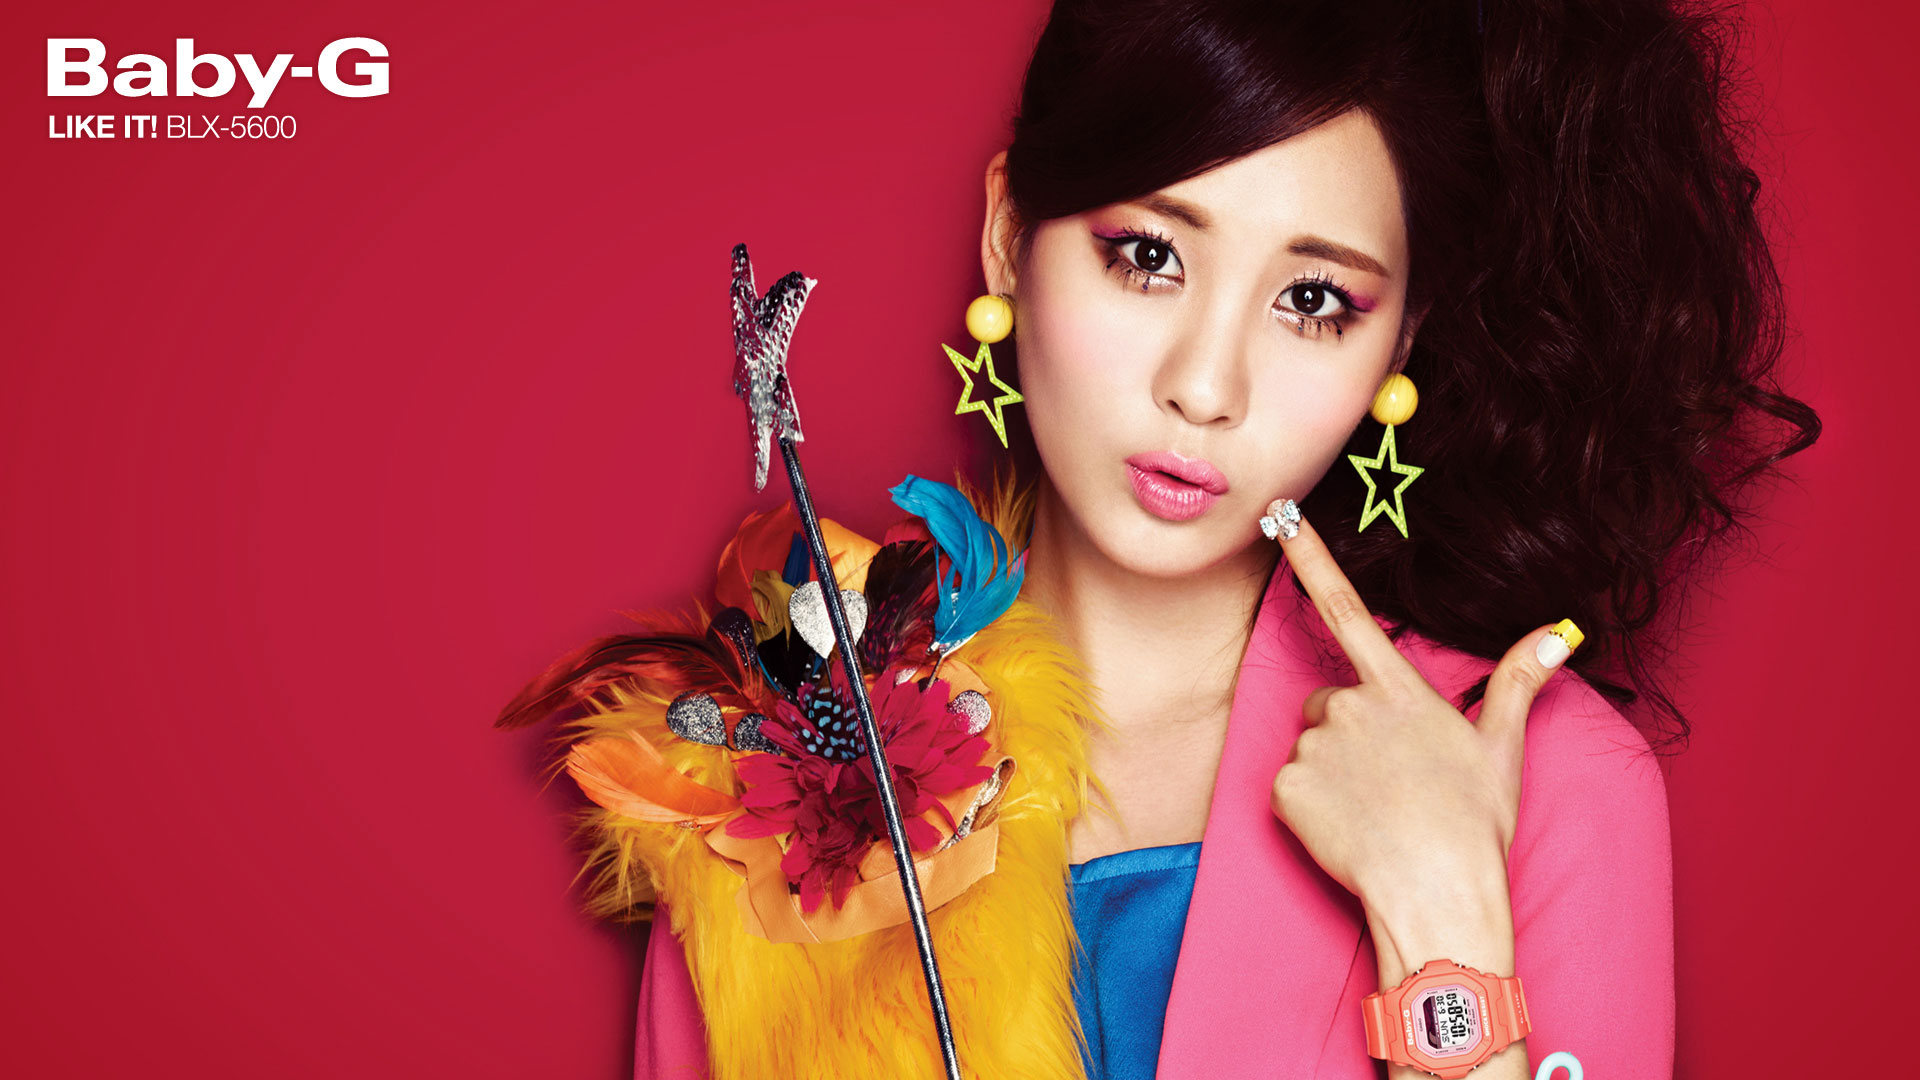 Snsd Seohyun Casio Baby G wallpaper